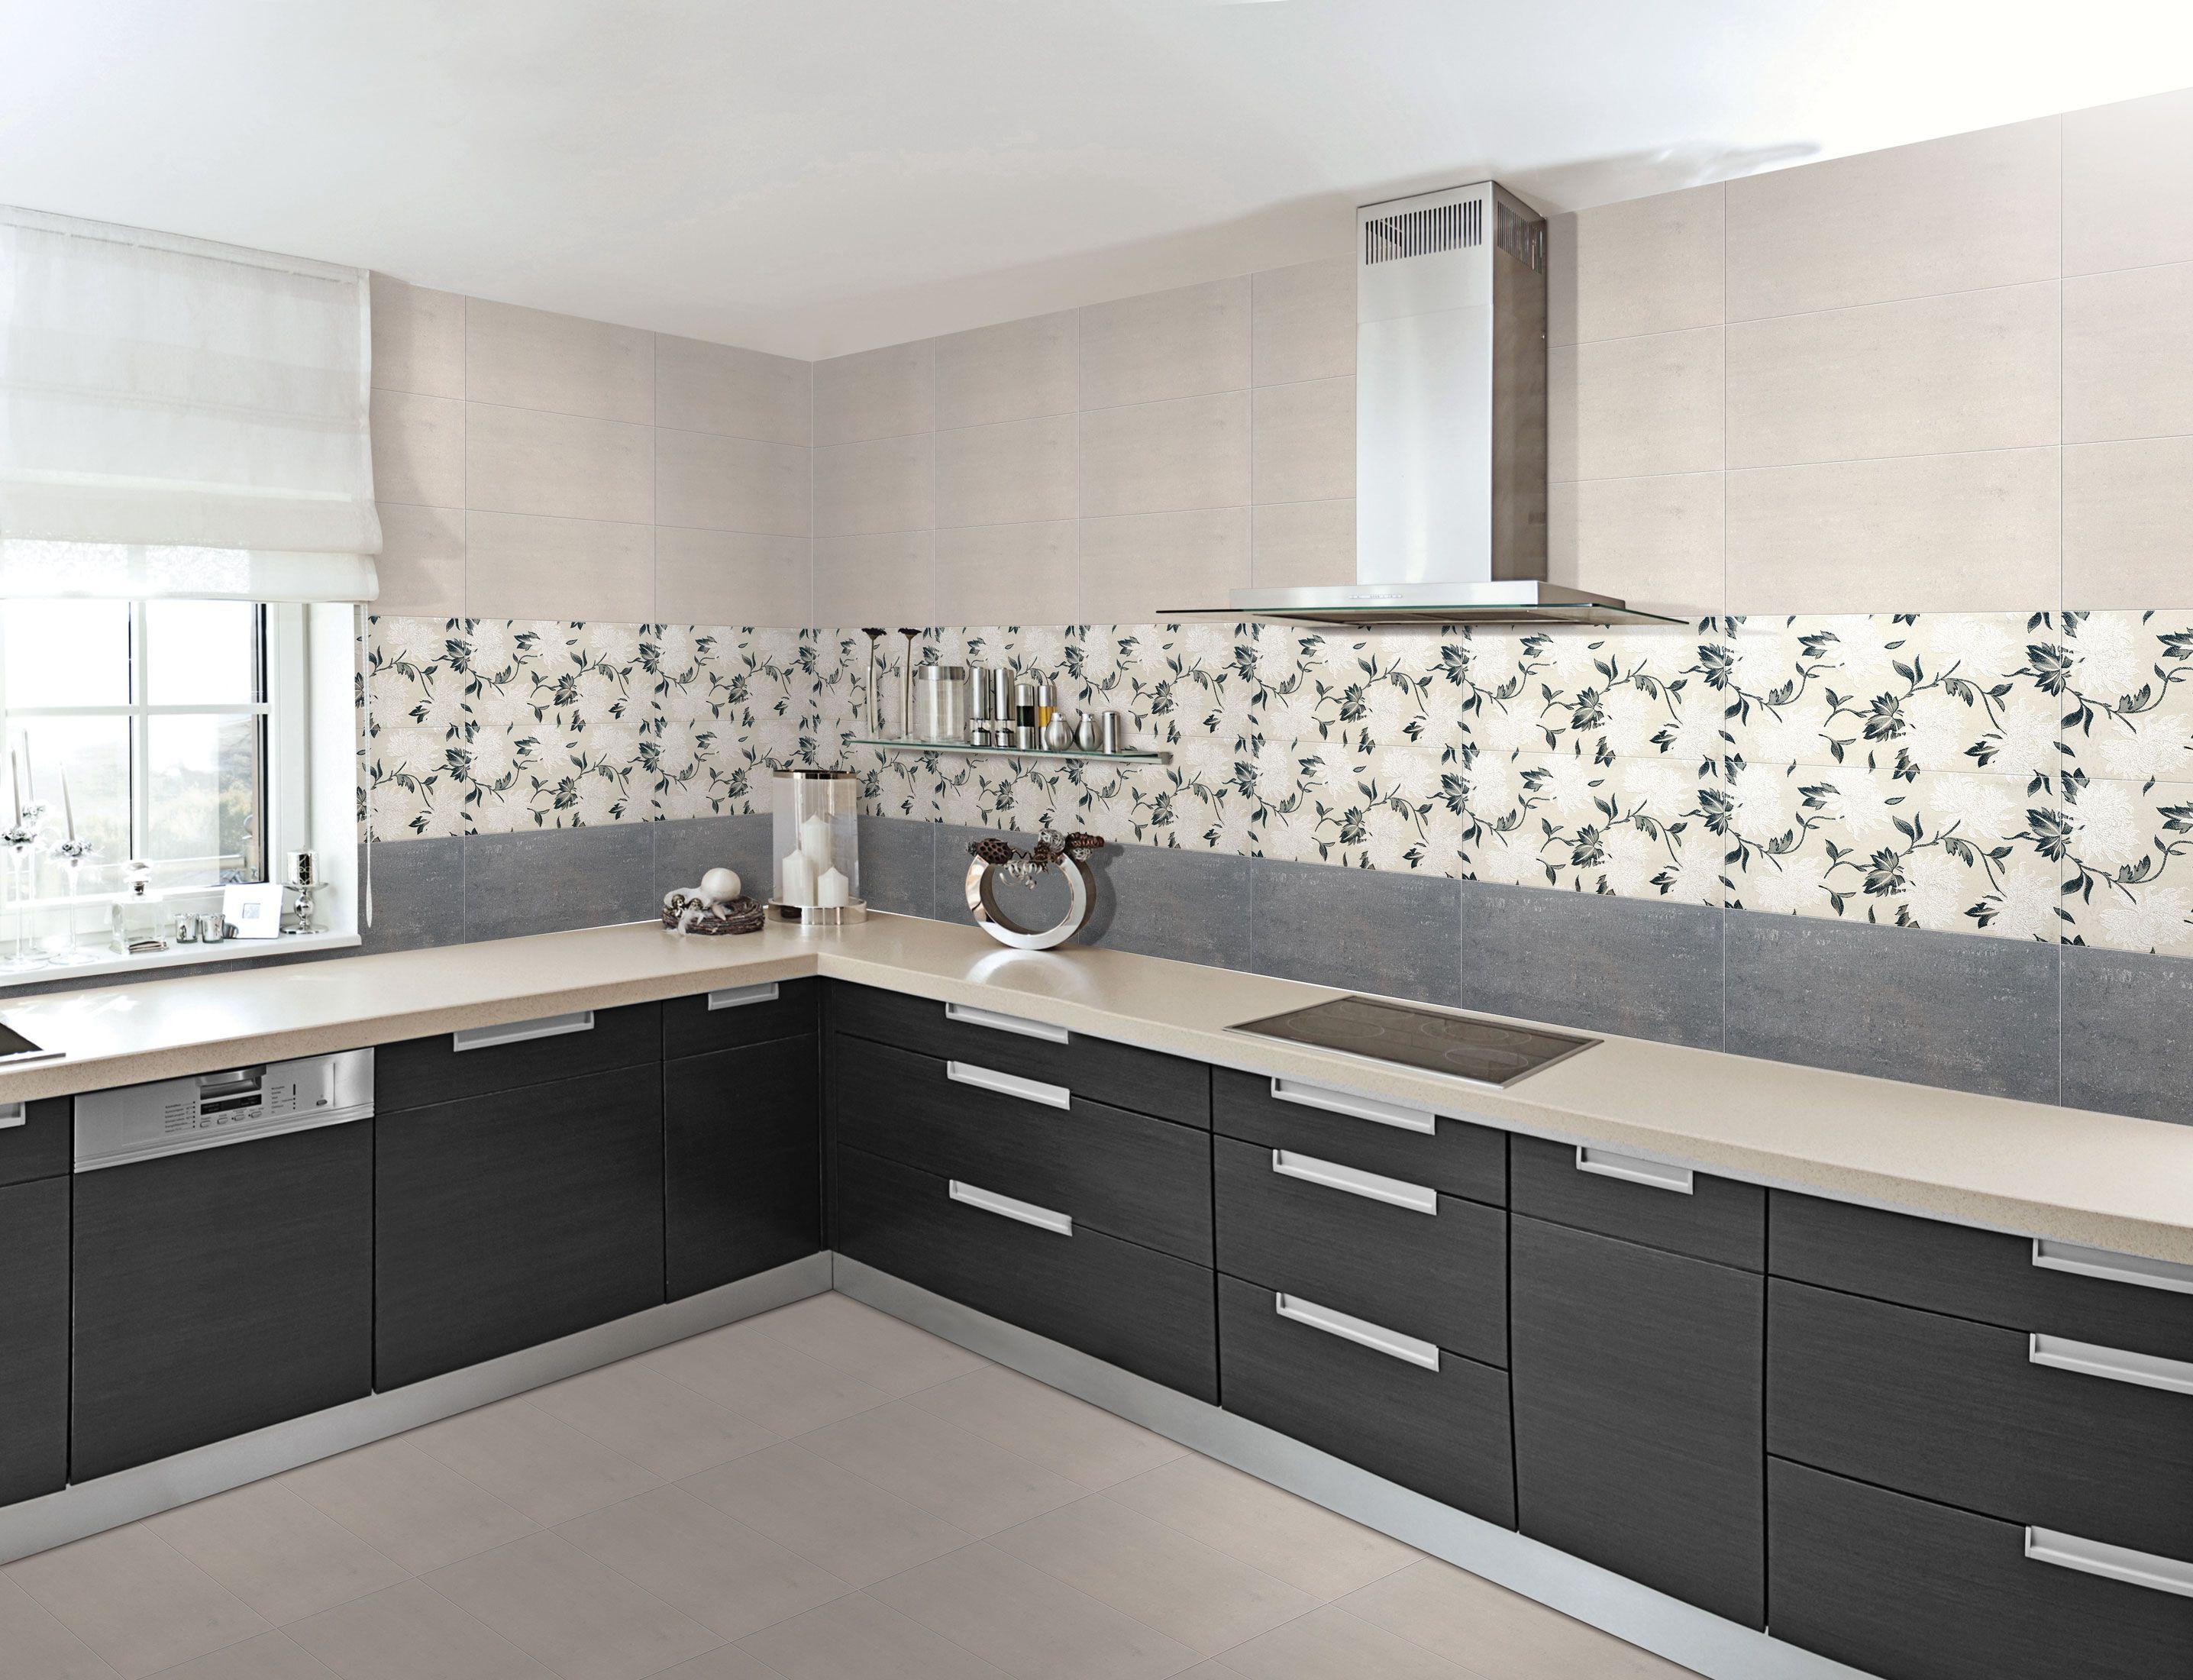 Kitchen Wall Tile Designs Cabinet Hinge Types Buy Designer Floor Tiles For Bathroom Bedroom Living Room Office Vitrified Exterior Ceramic Online India